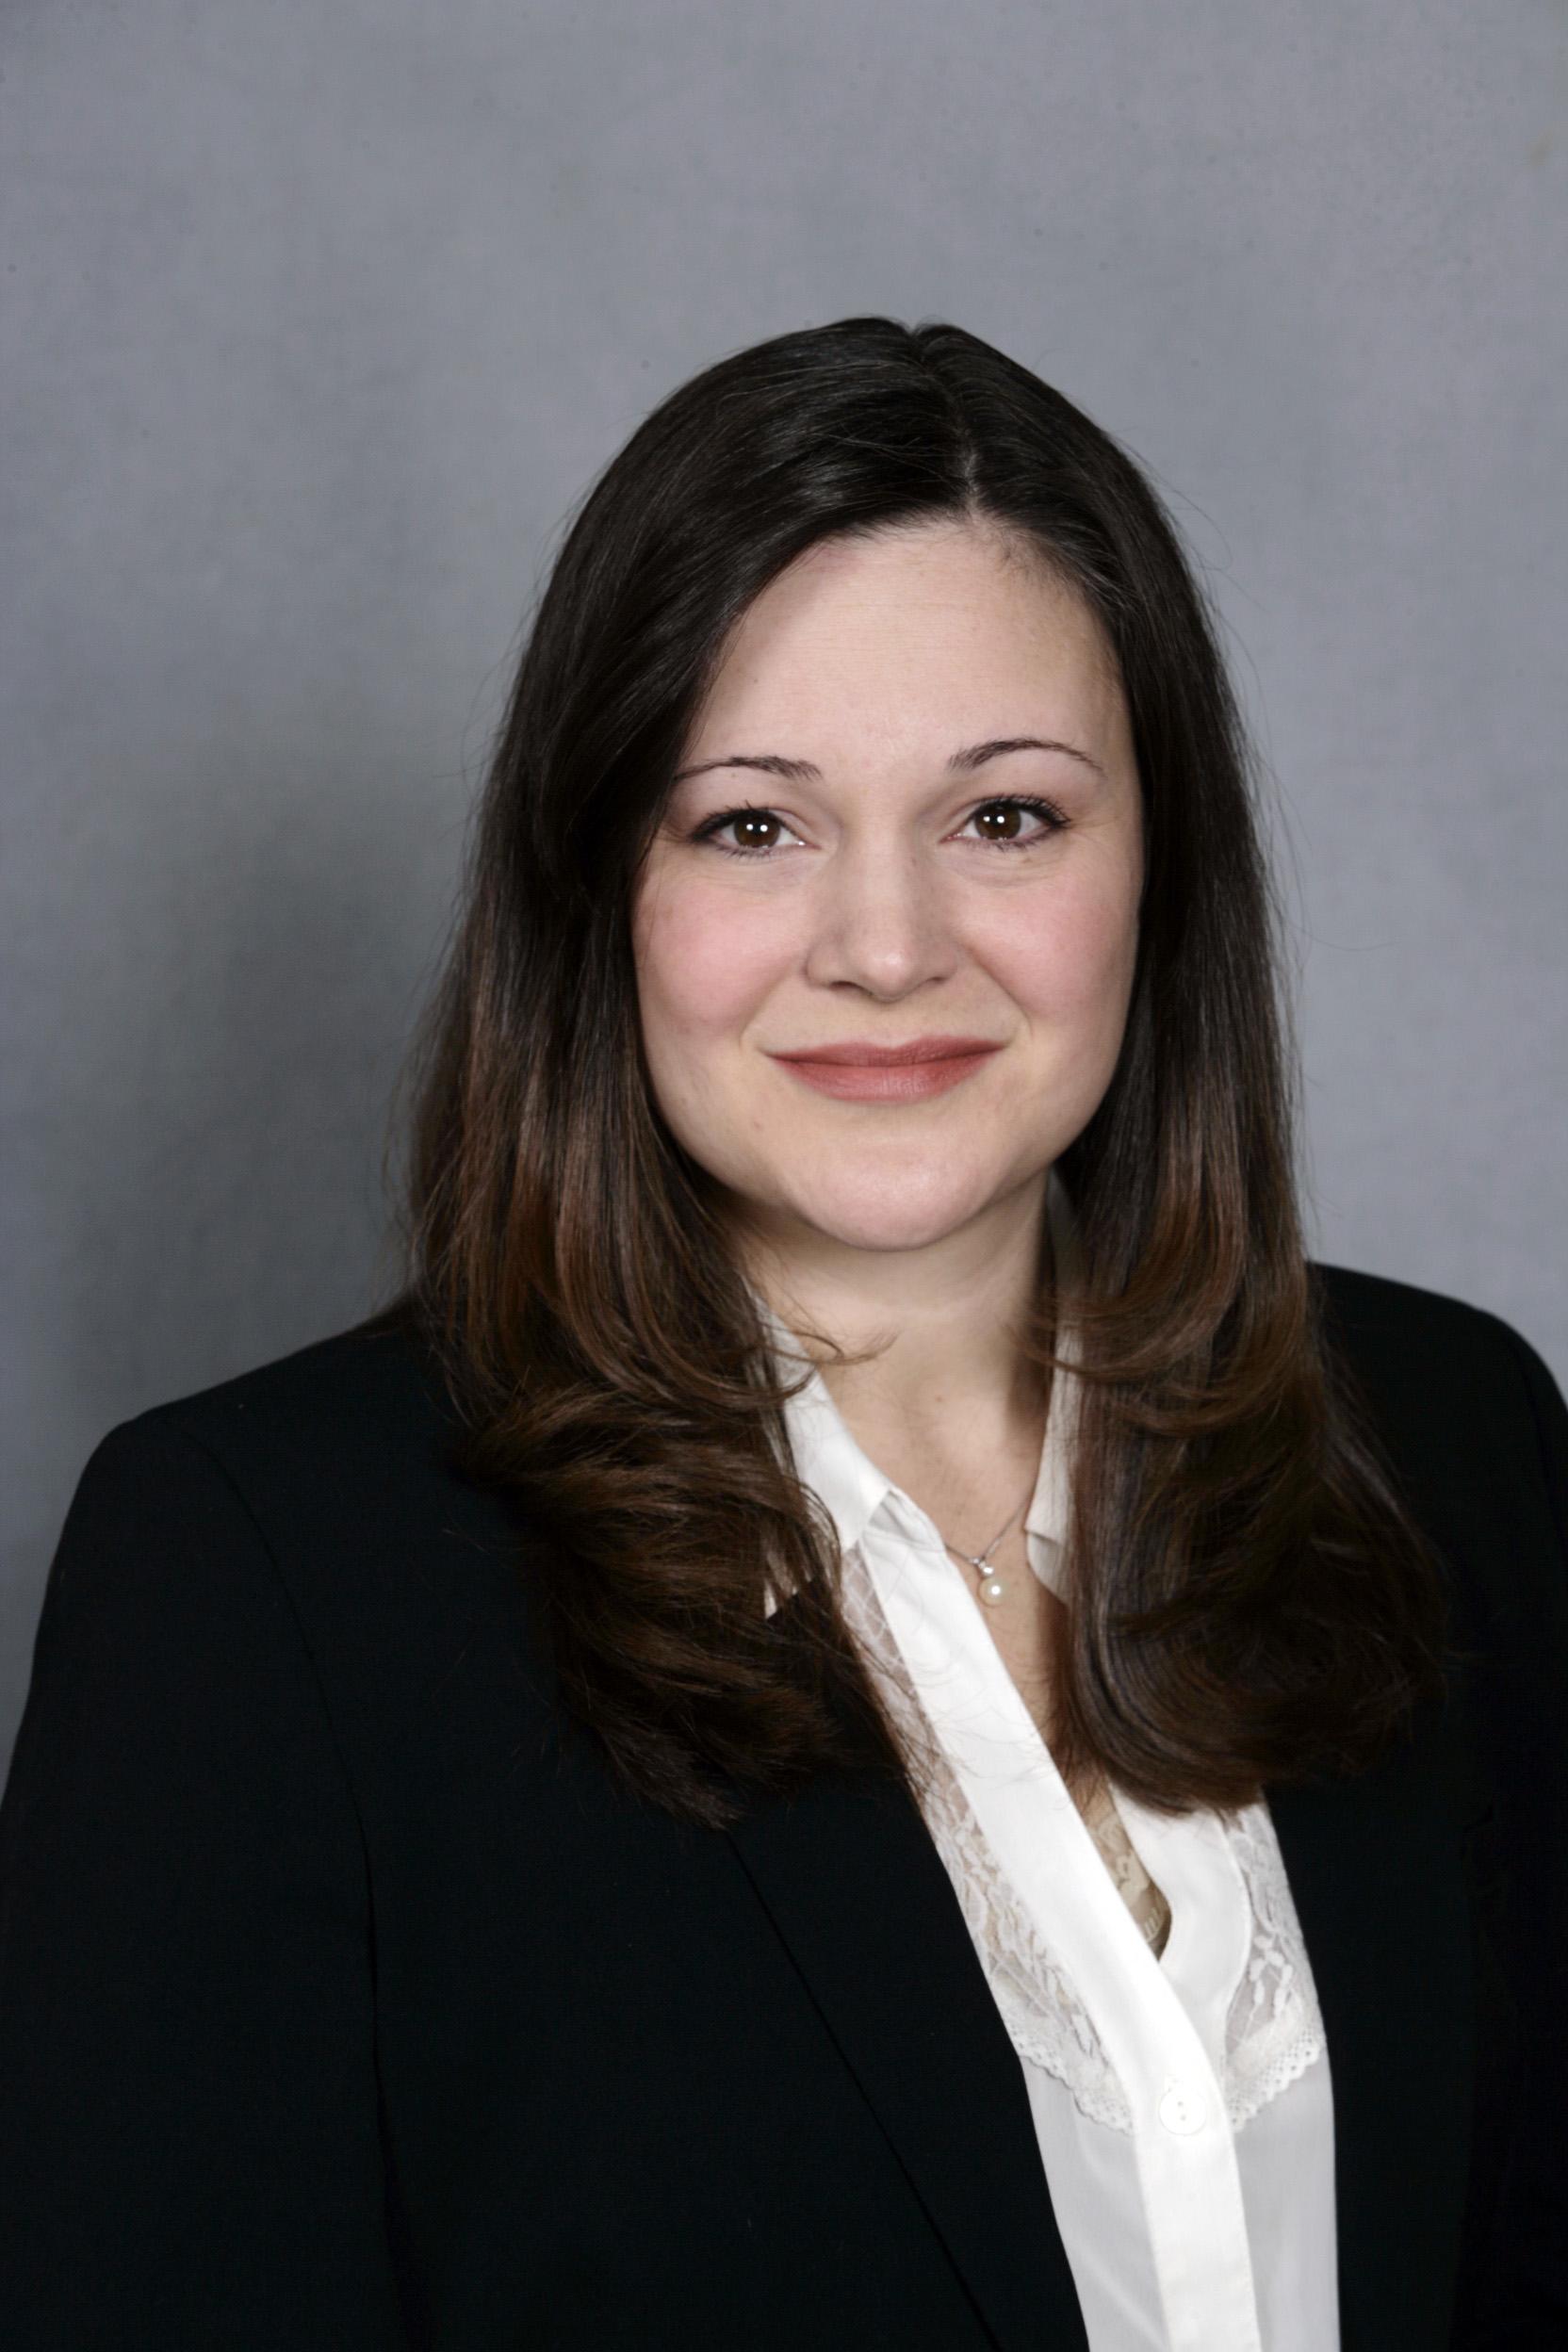 Stephanie Mastropaolo—Coordinator of the Family Care Center, Calvary Hospital.